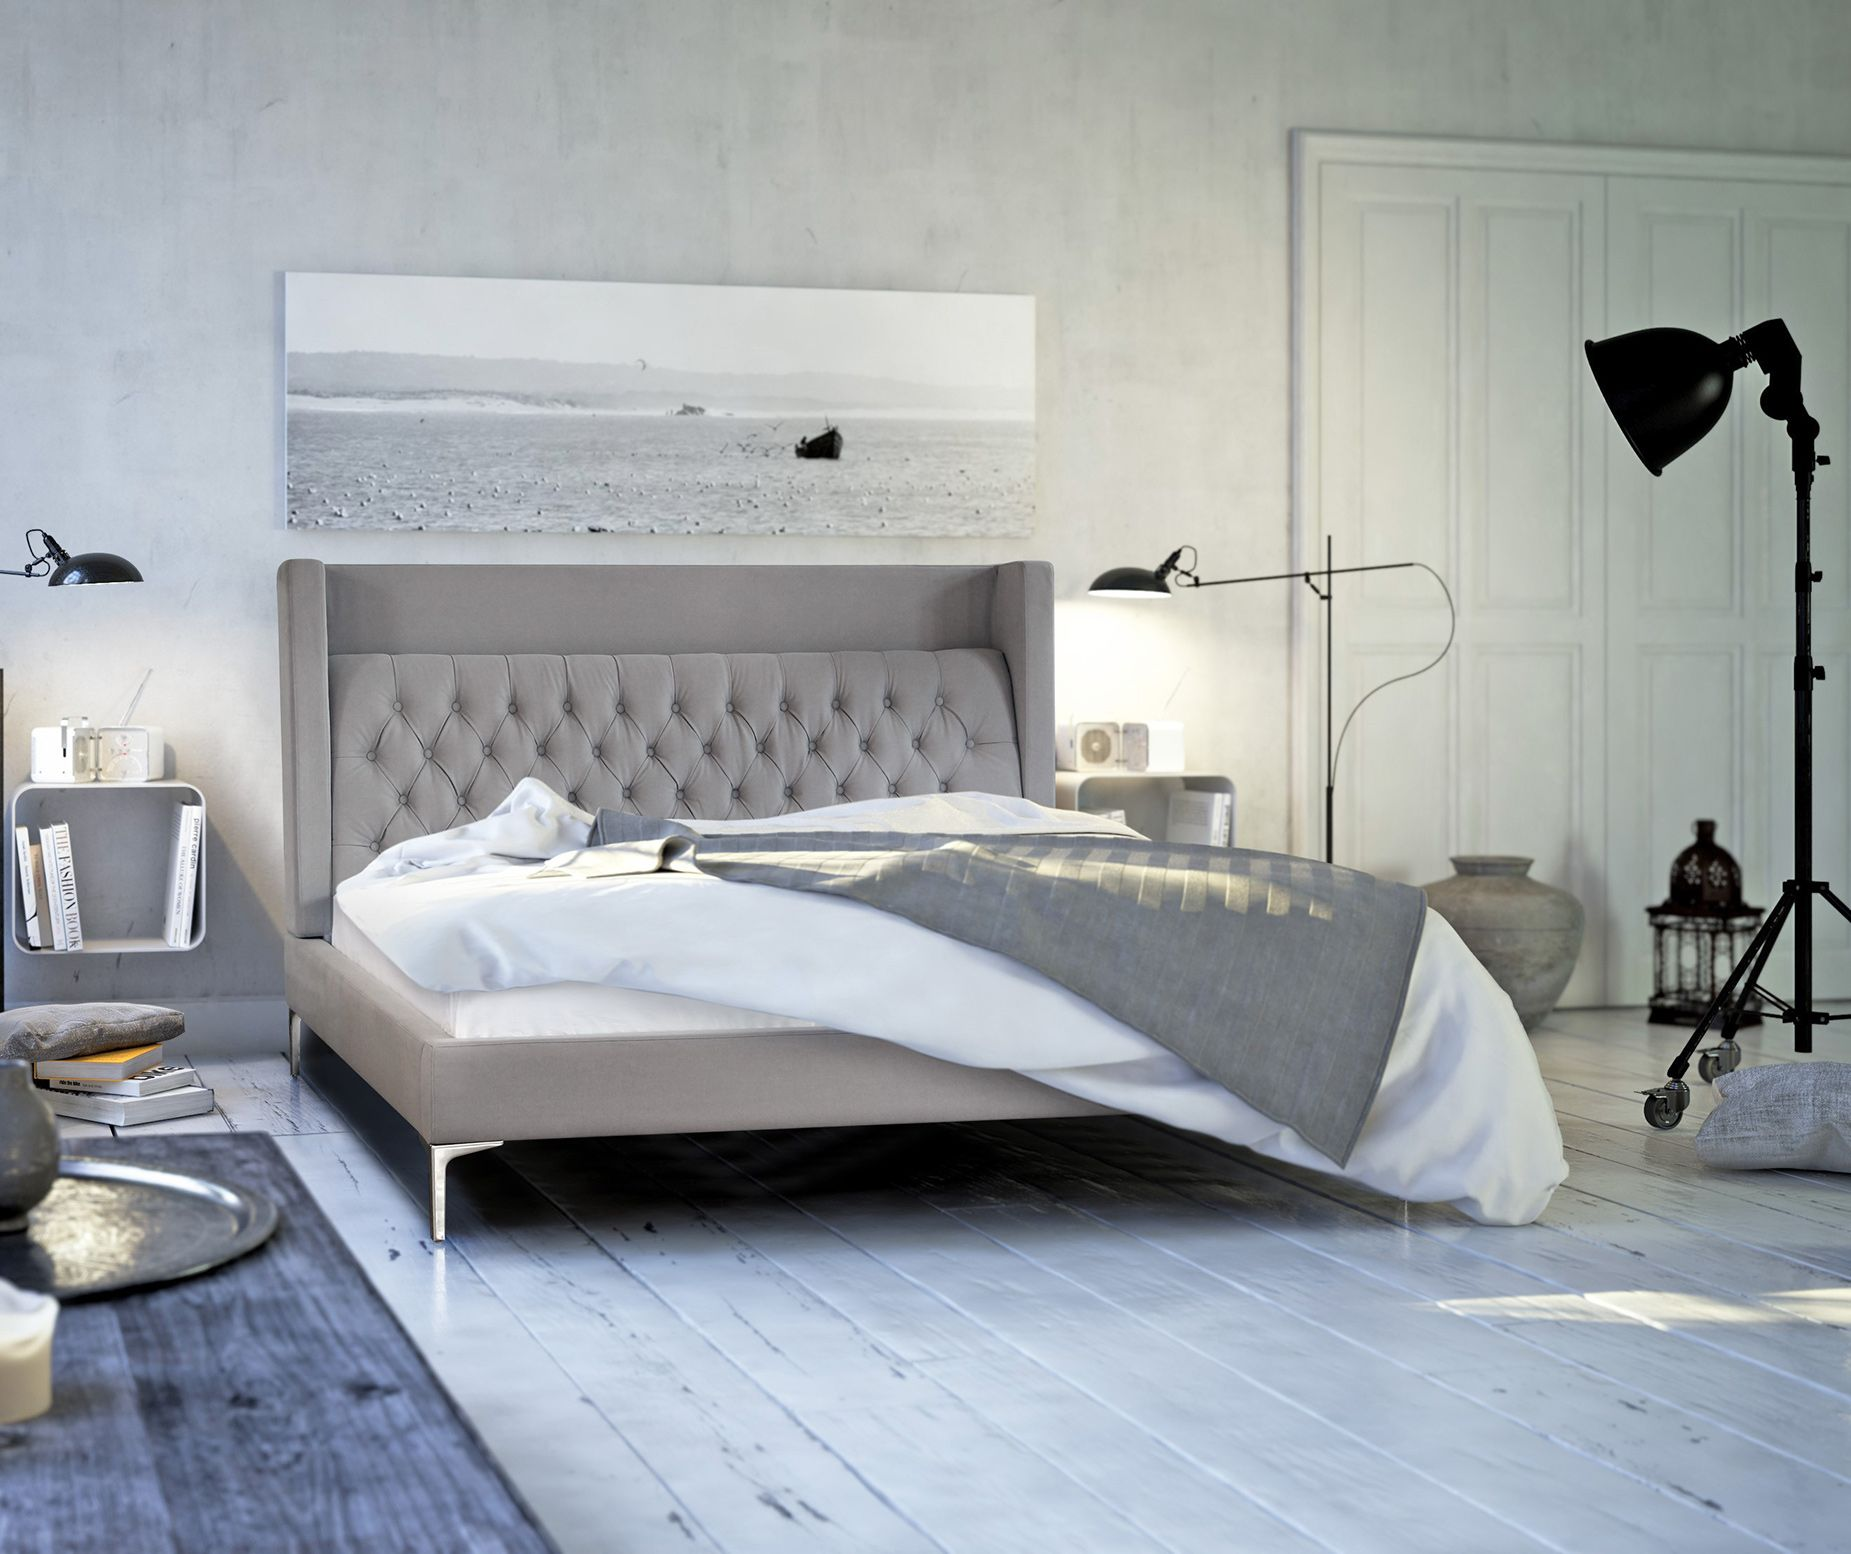 NIDO - Polsterbett | neuheiten | Pinterest | Polsterbett, Betten und ...